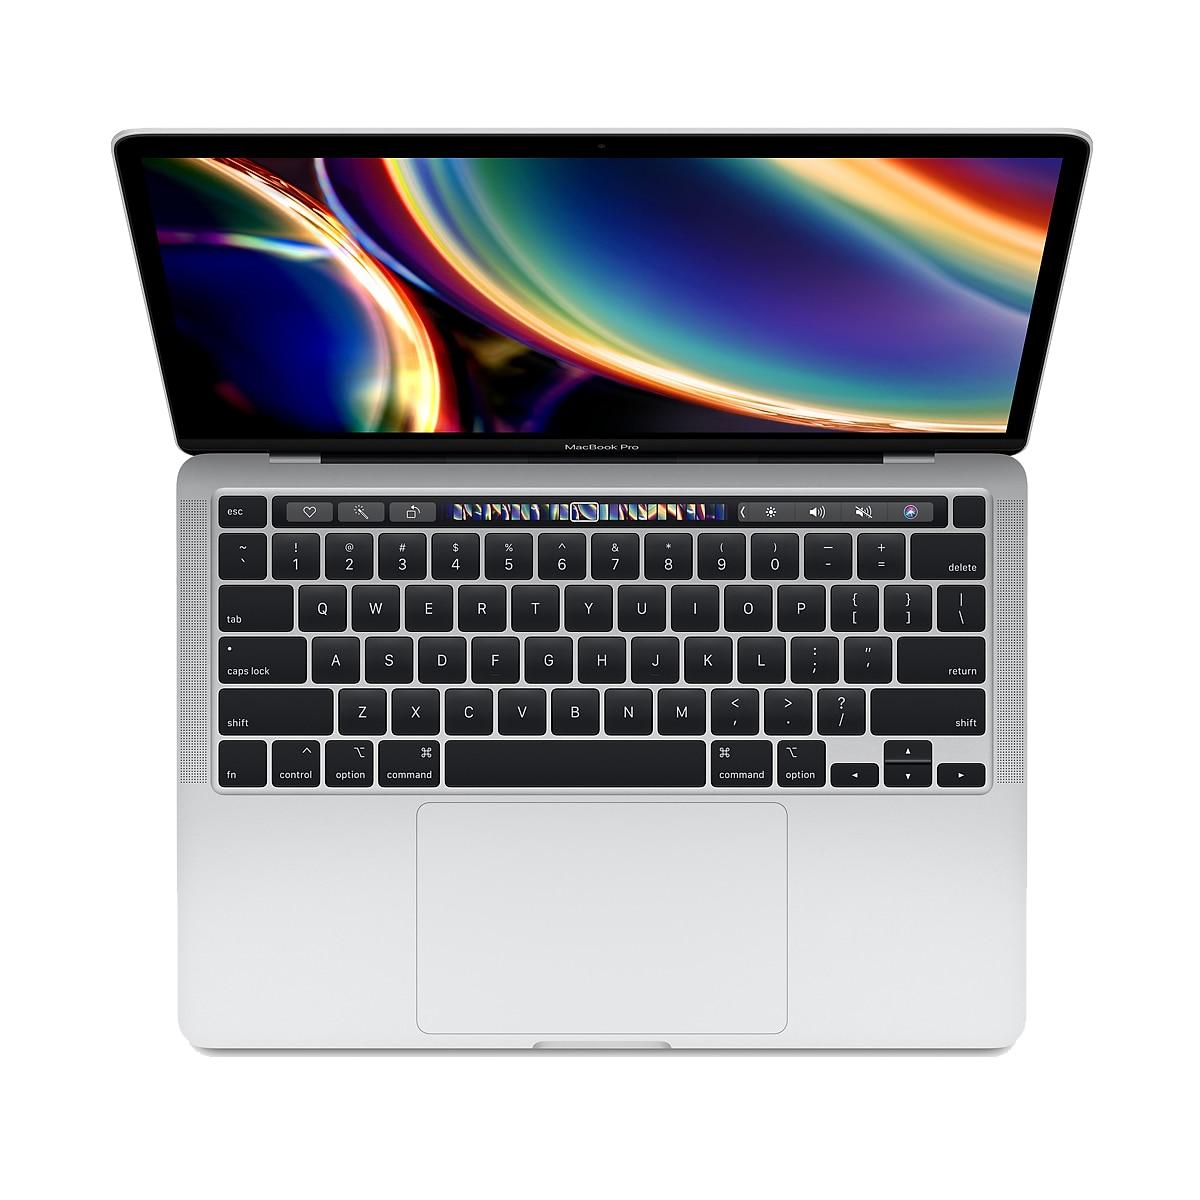 MacBook Pro 13-inch i7/2.3GHz 16GB 512GBSSD Silver